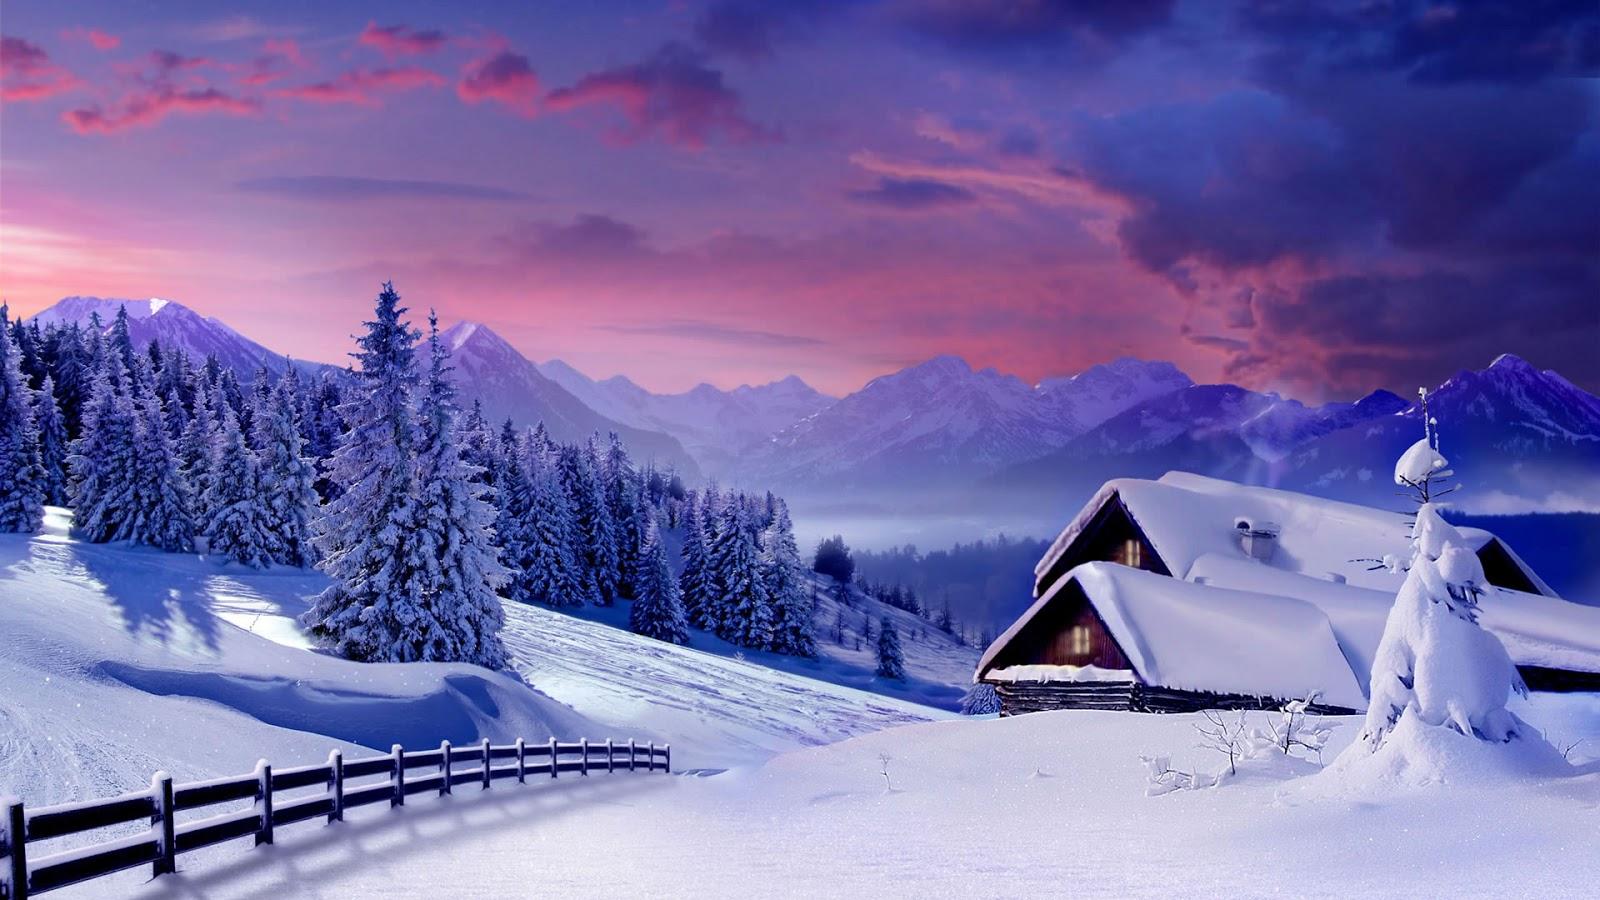 46 Hd Winter Wallpapers 1080p On Wallpapersafari